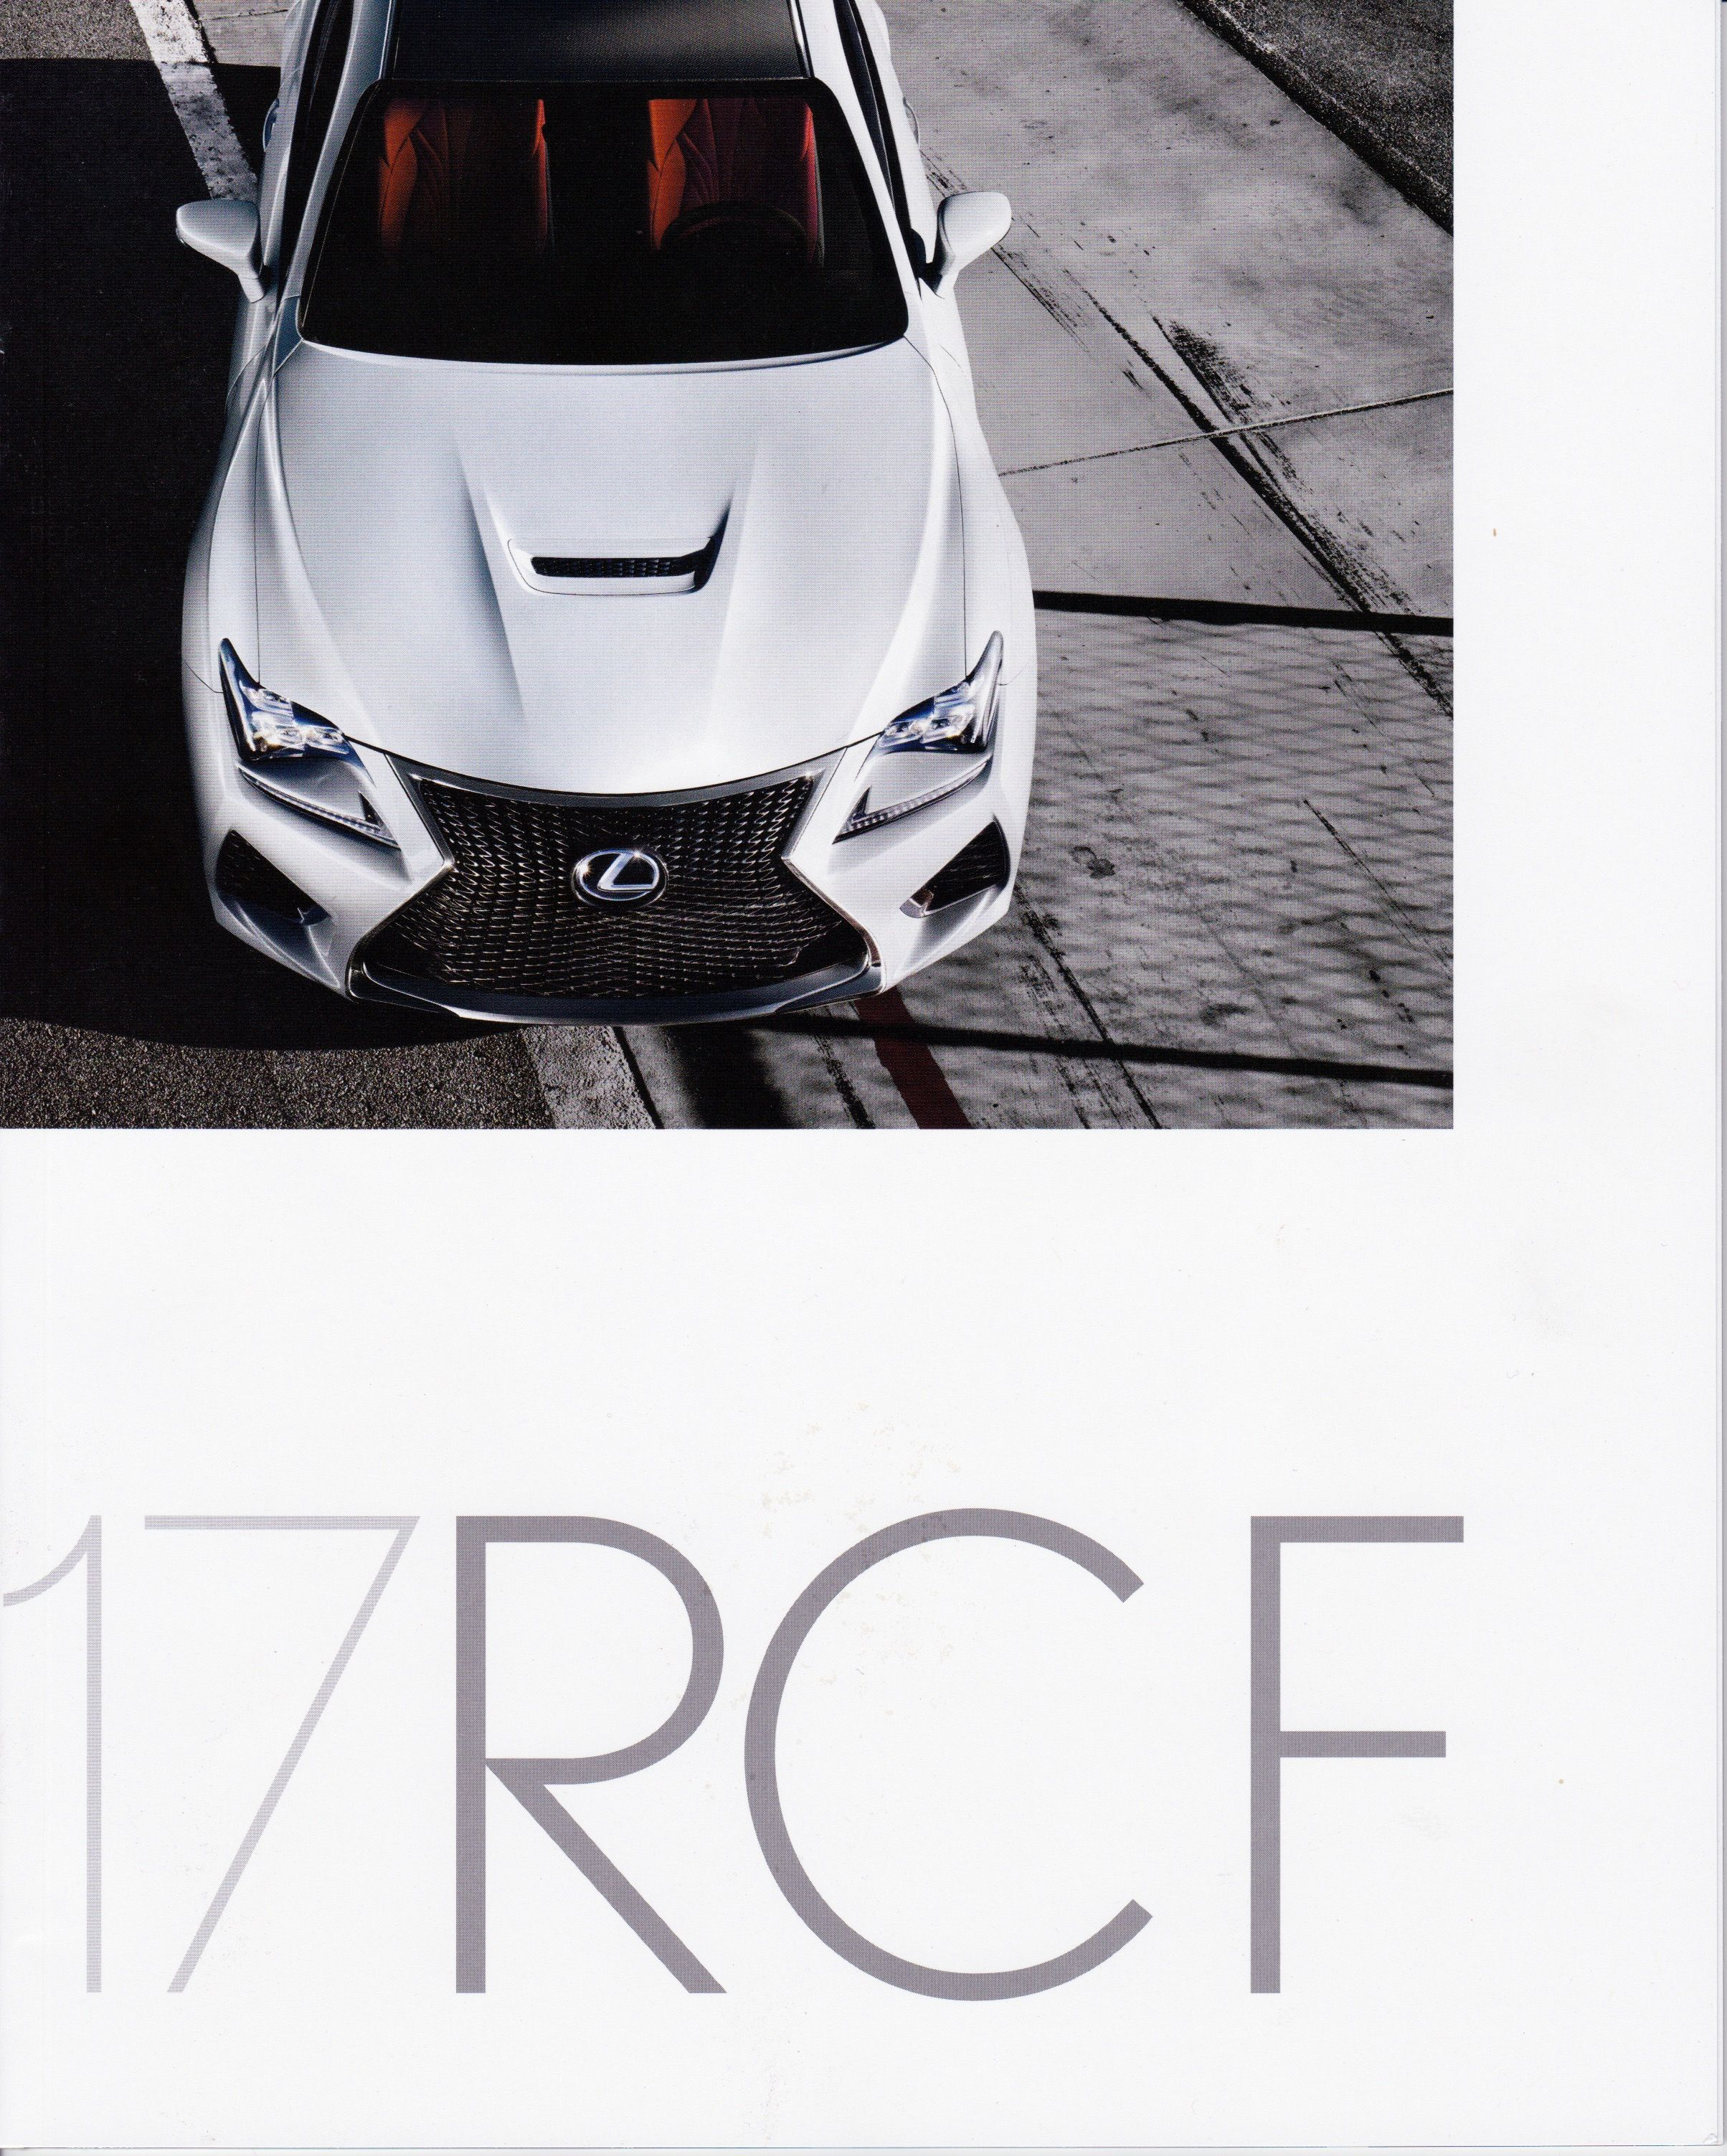 2017 Lexus RC F Lexus car cars LFA Automotive